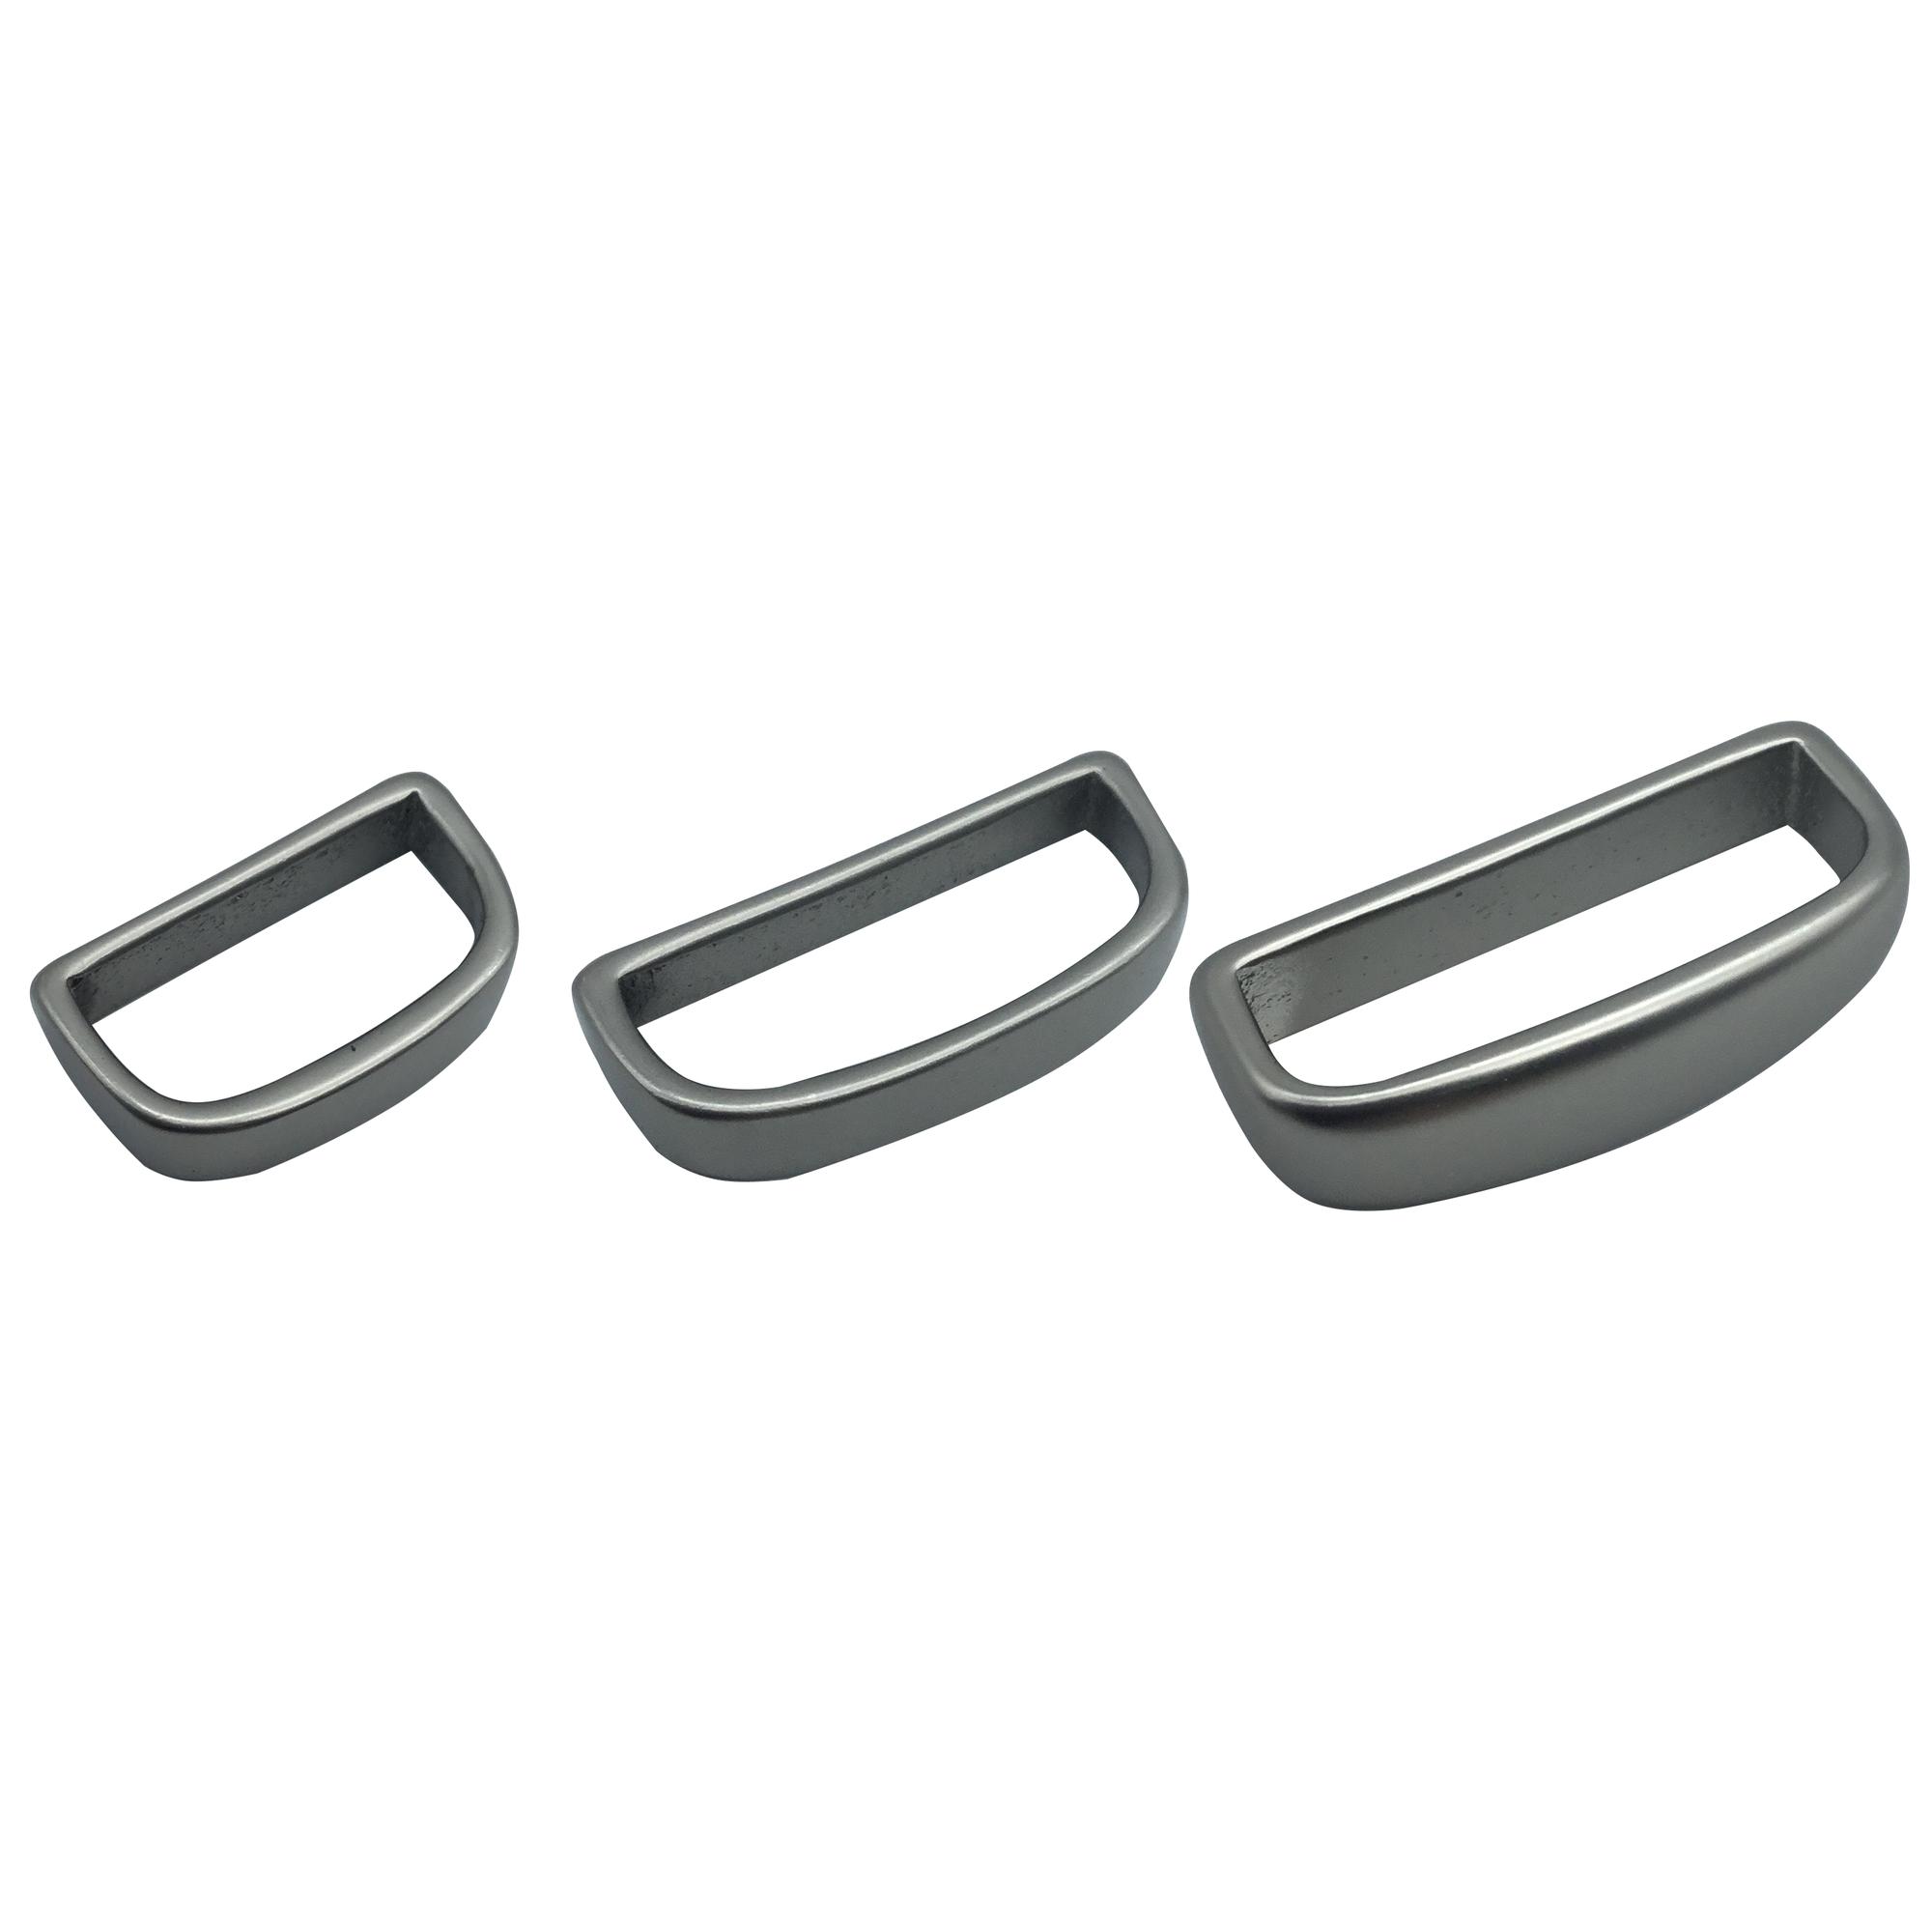 Solid Brass Bulk Keepers - Matte Nickel